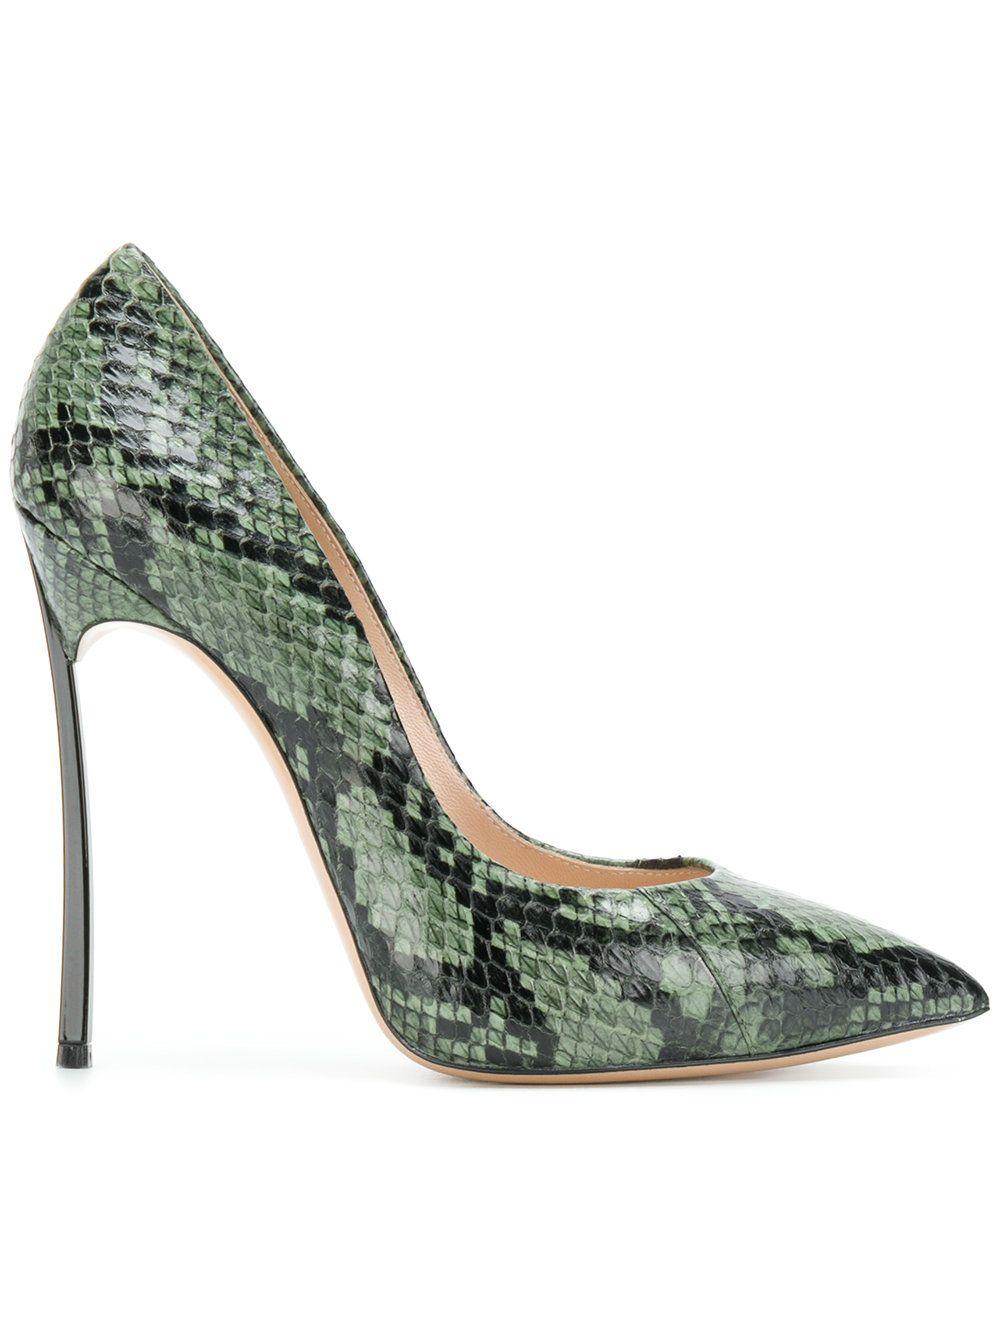 ad963836e7d CASADEI | Blade snakeskin pumps #Shoes #CASADEI | Fashion | Shoes ...